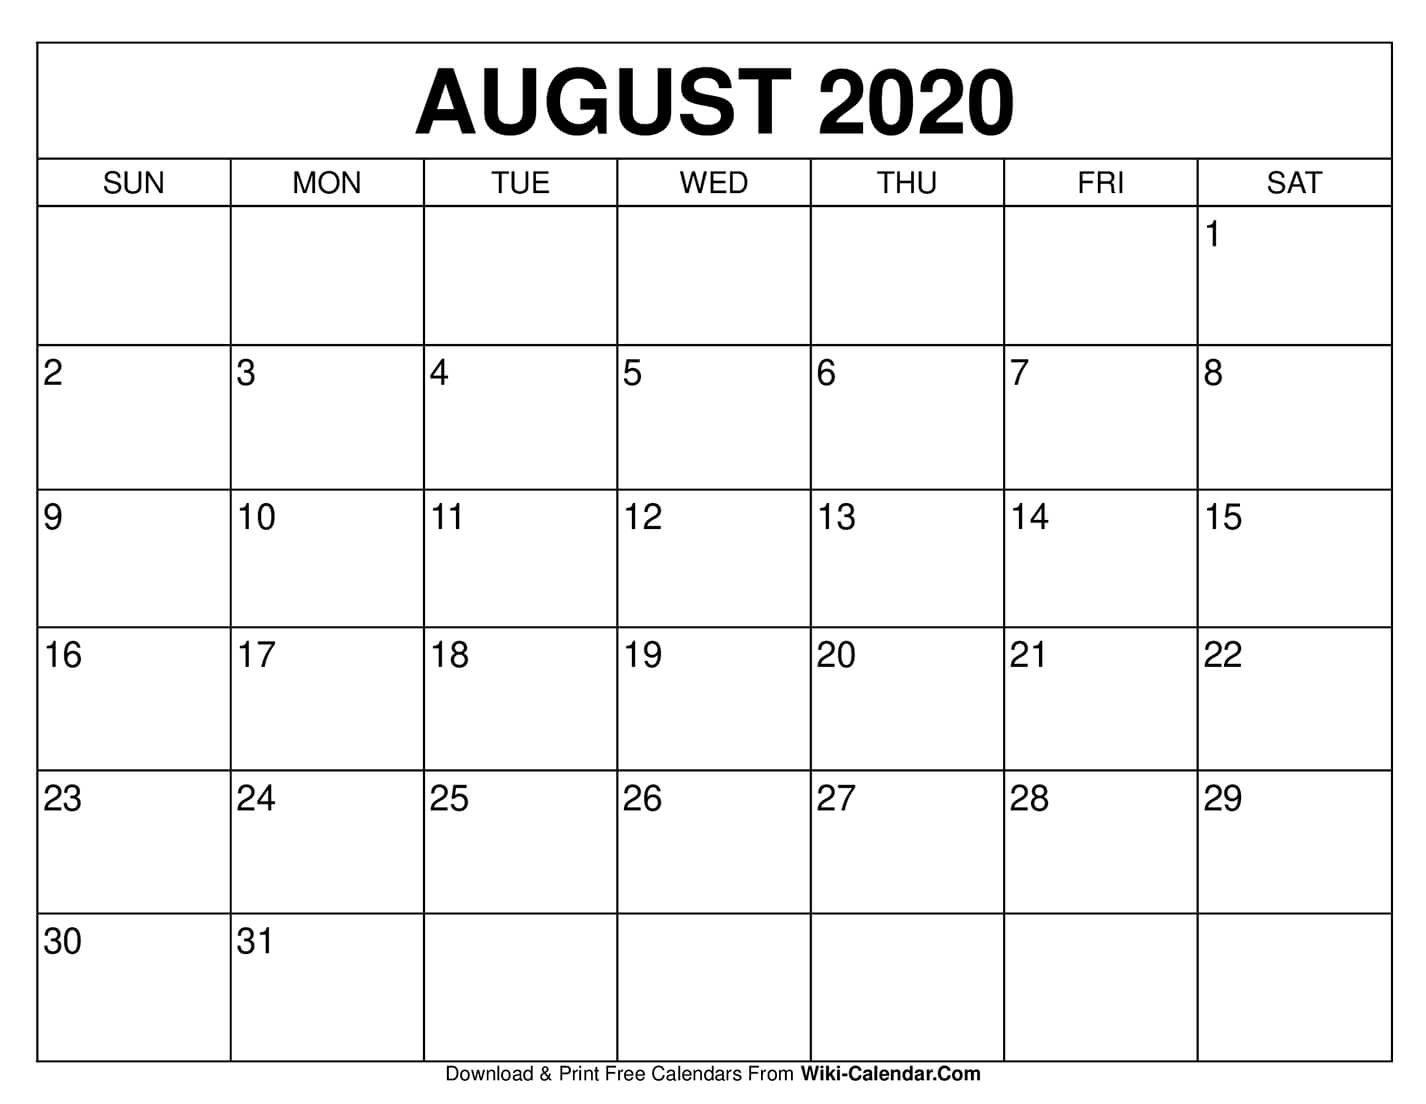 Free Printable August 2020 Calendars Free No Download Printable Calendars